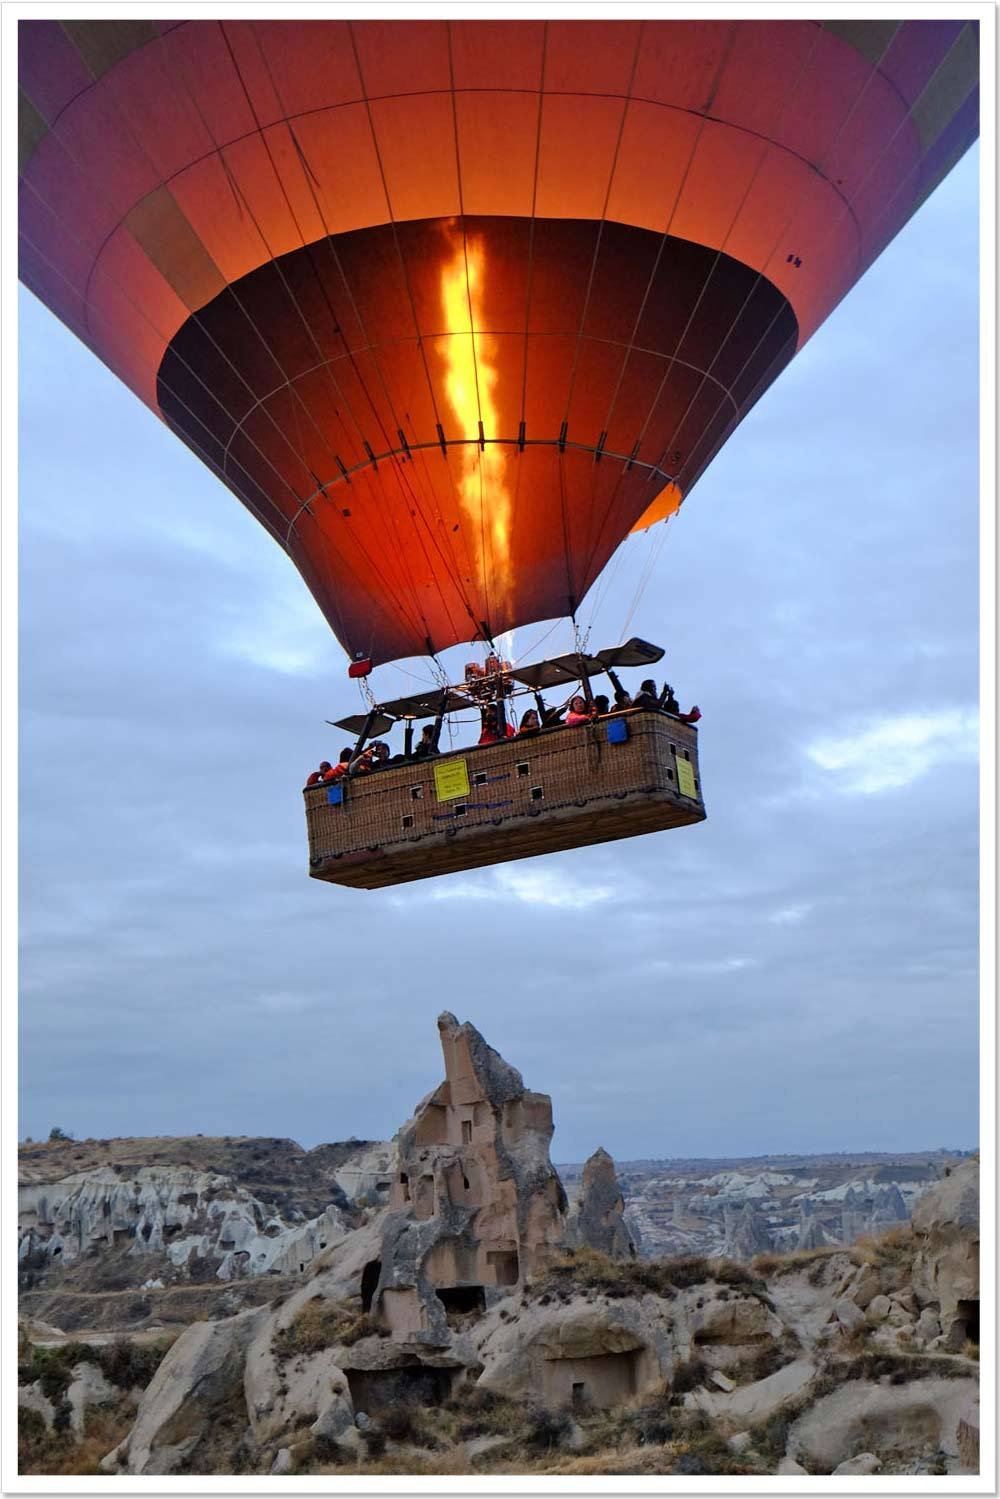 I rode a hot air balloon in Turkey.